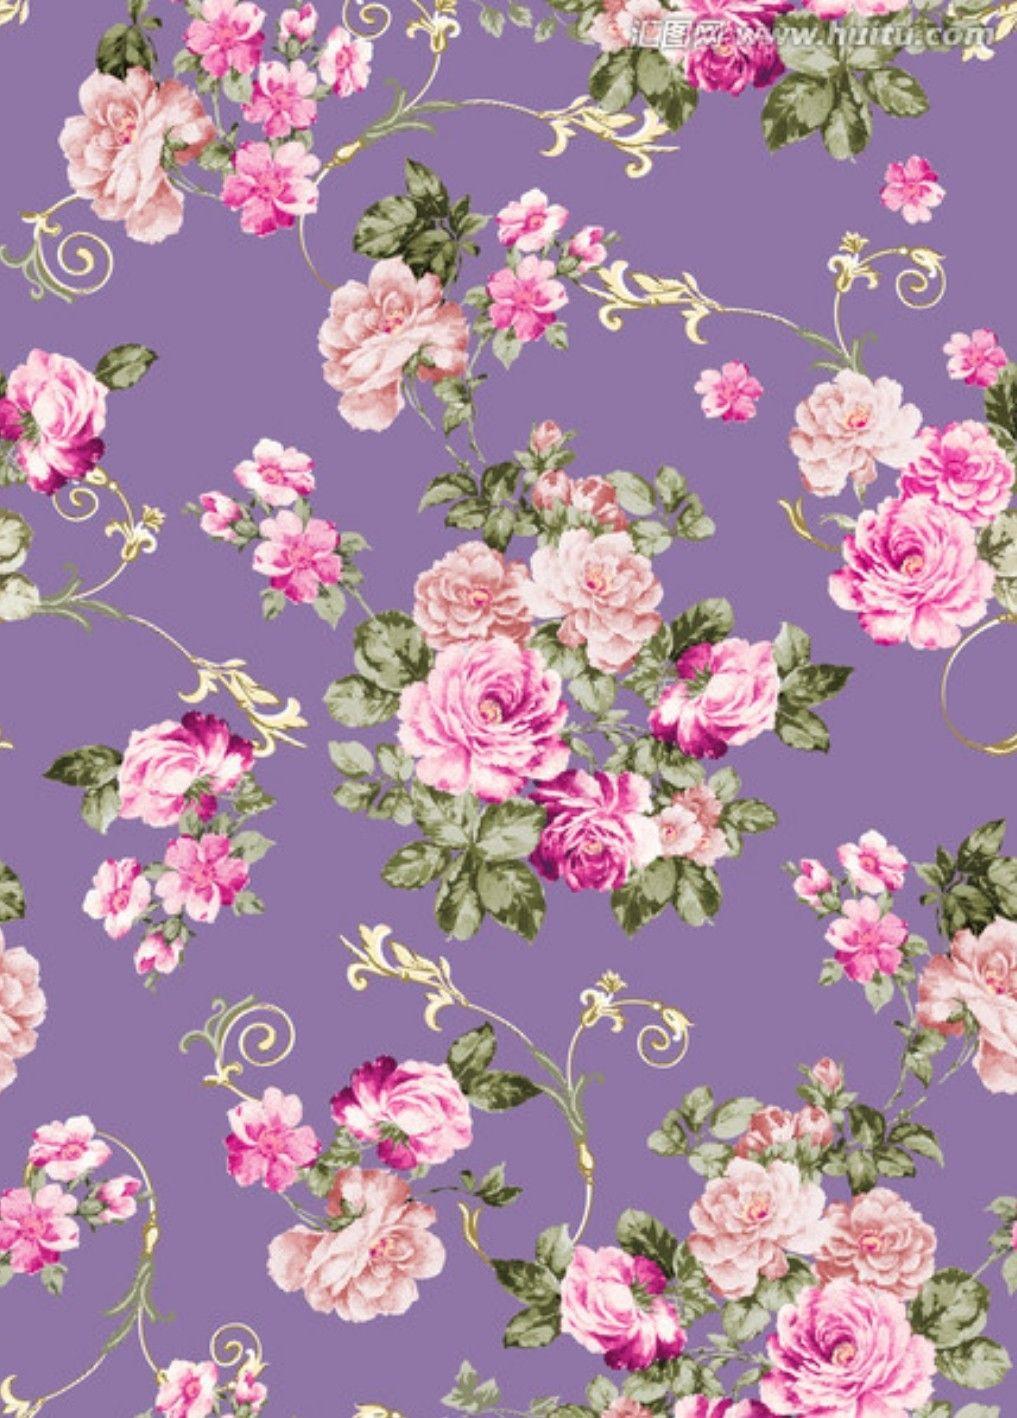 Flower Wallpaper Vintage